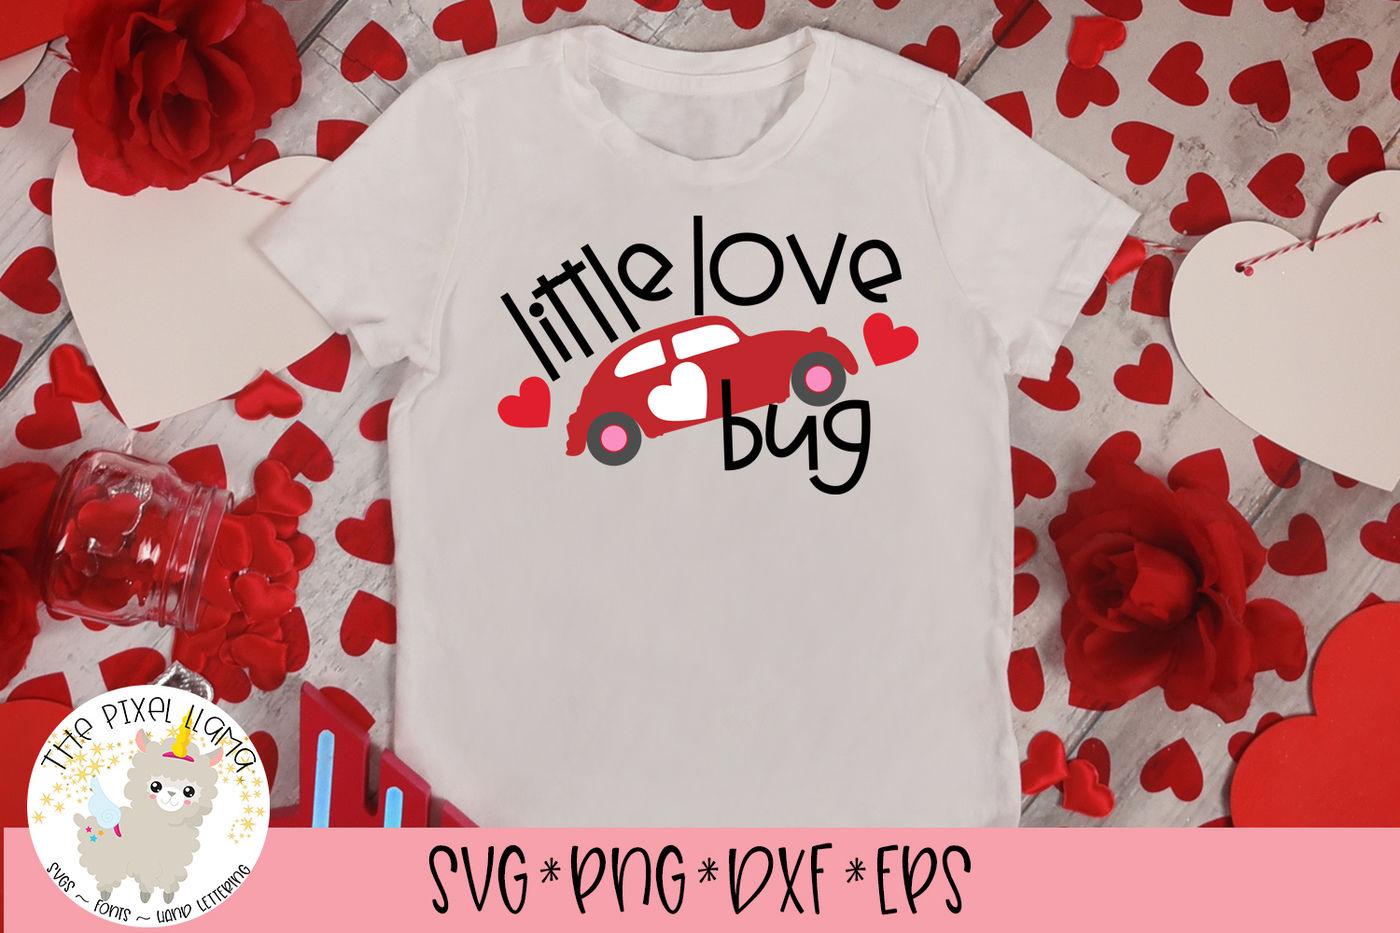 Little Love Bug Svg Cut File By The Pixel Llama Thehungryjpeg Com